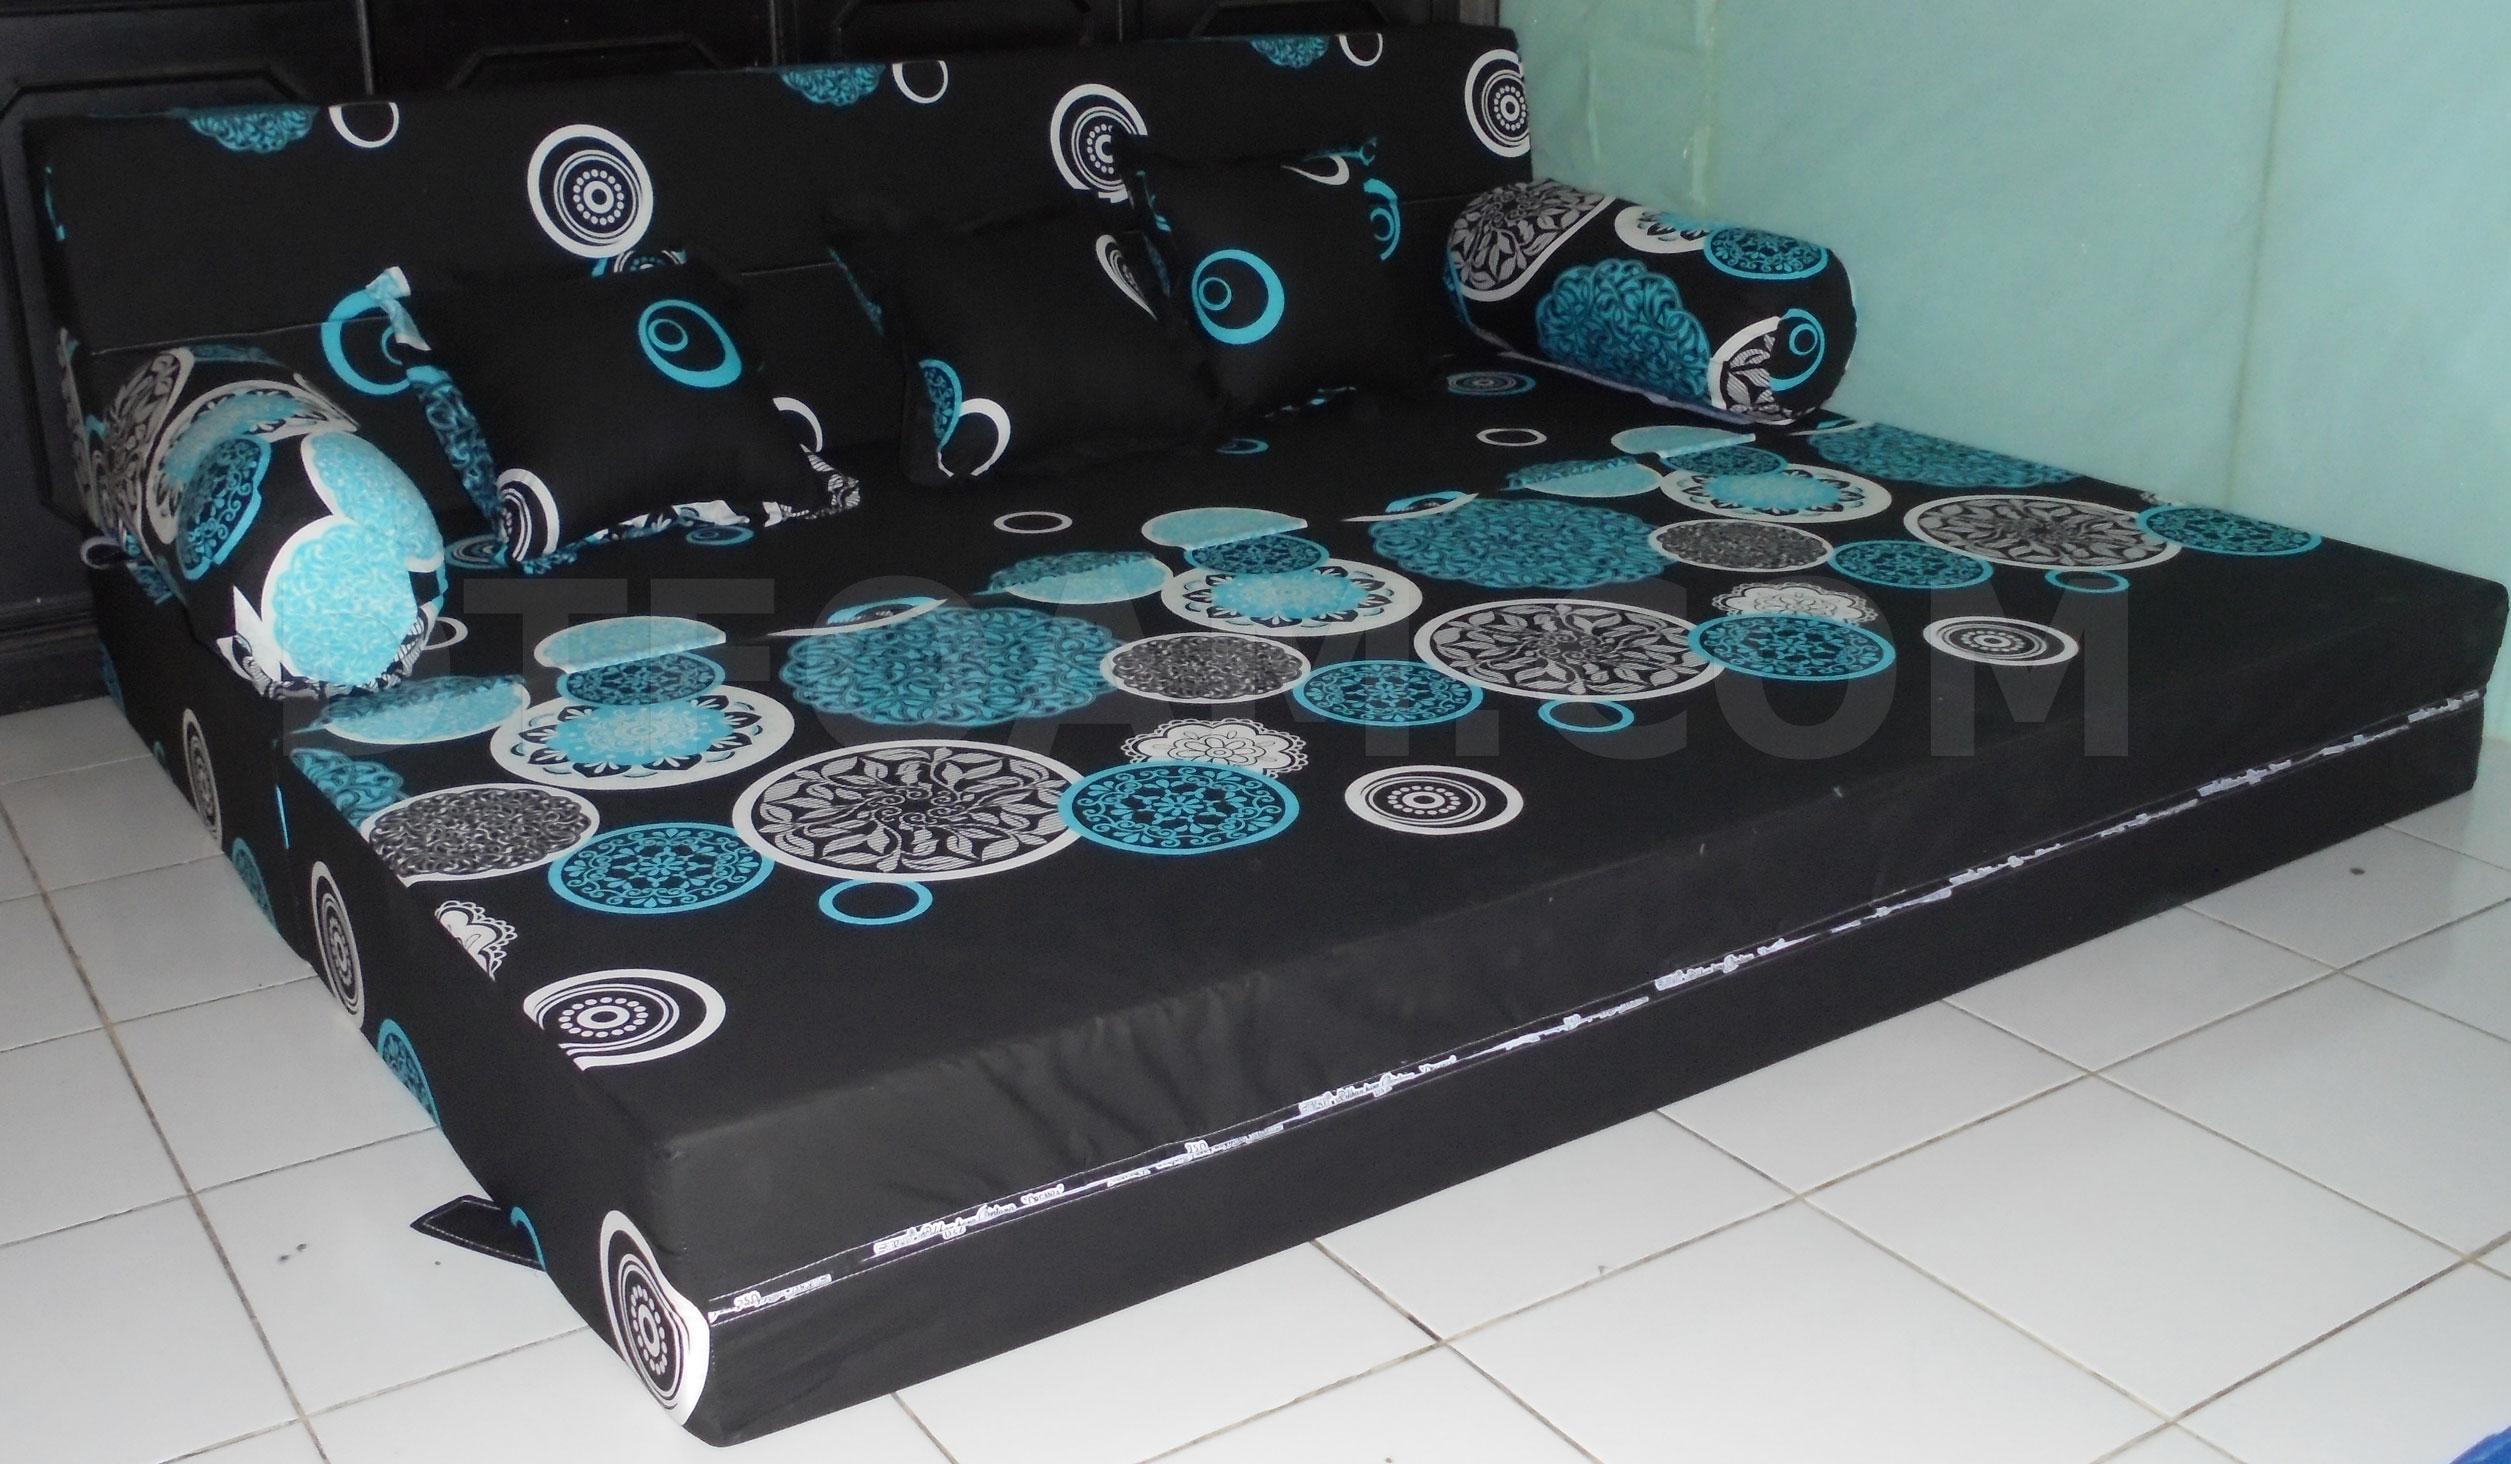 sofa bed kasur busa lipat inoac jakarta bamboo set singapore full moon hitam pelengkap furniture anda